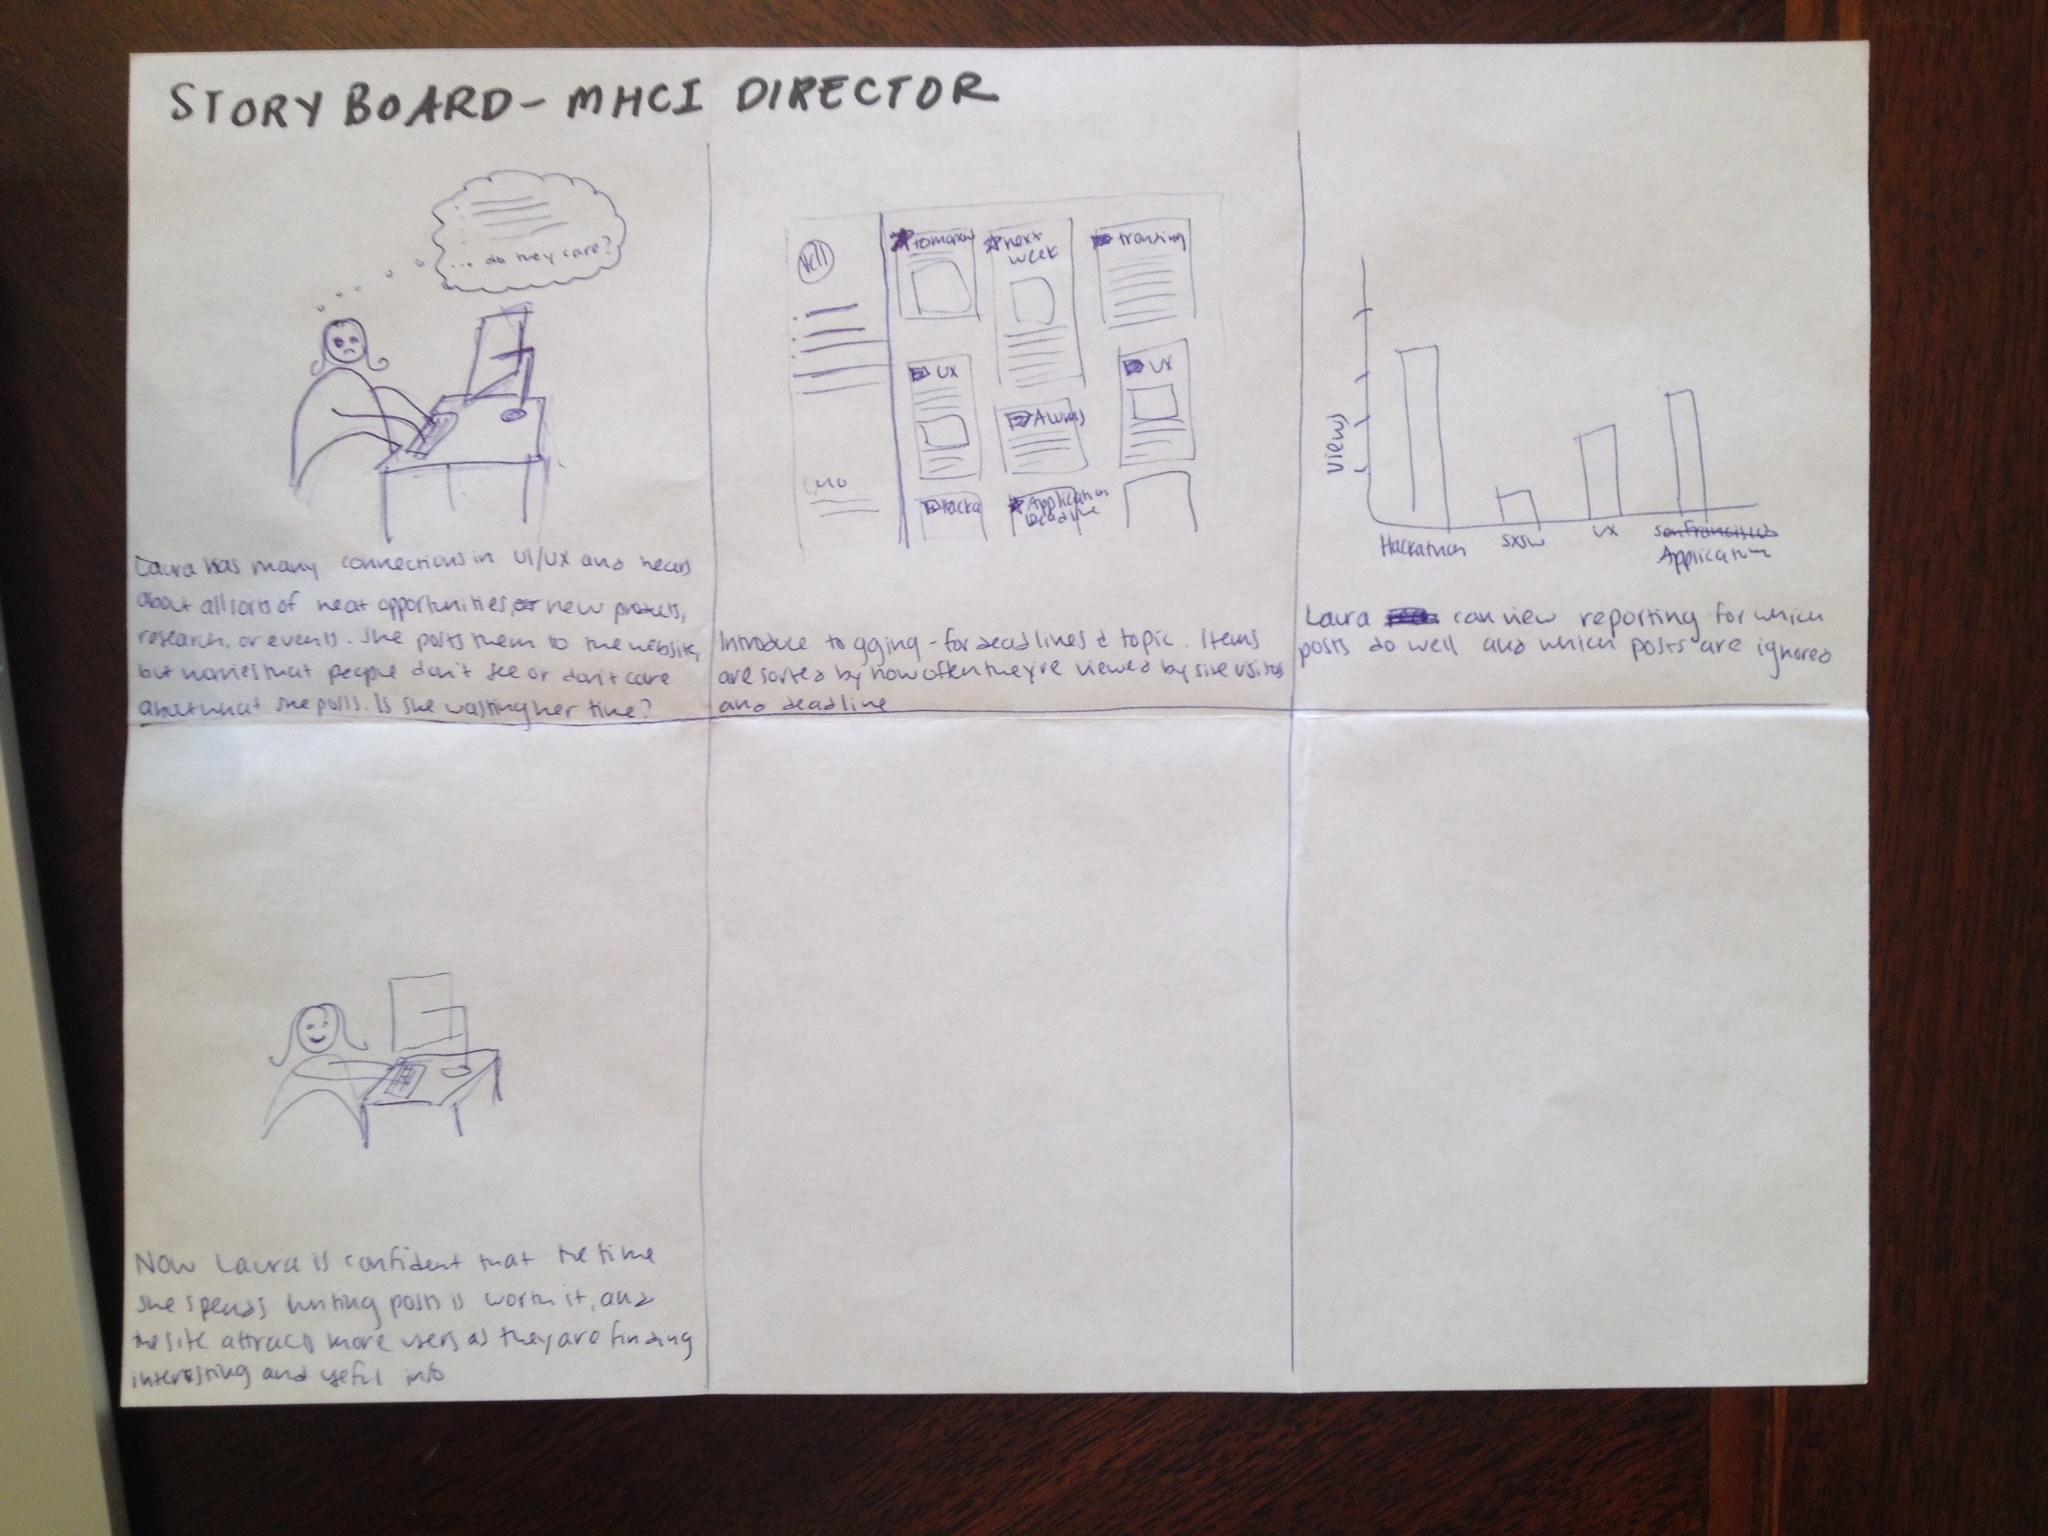 Storyboard - Director.png